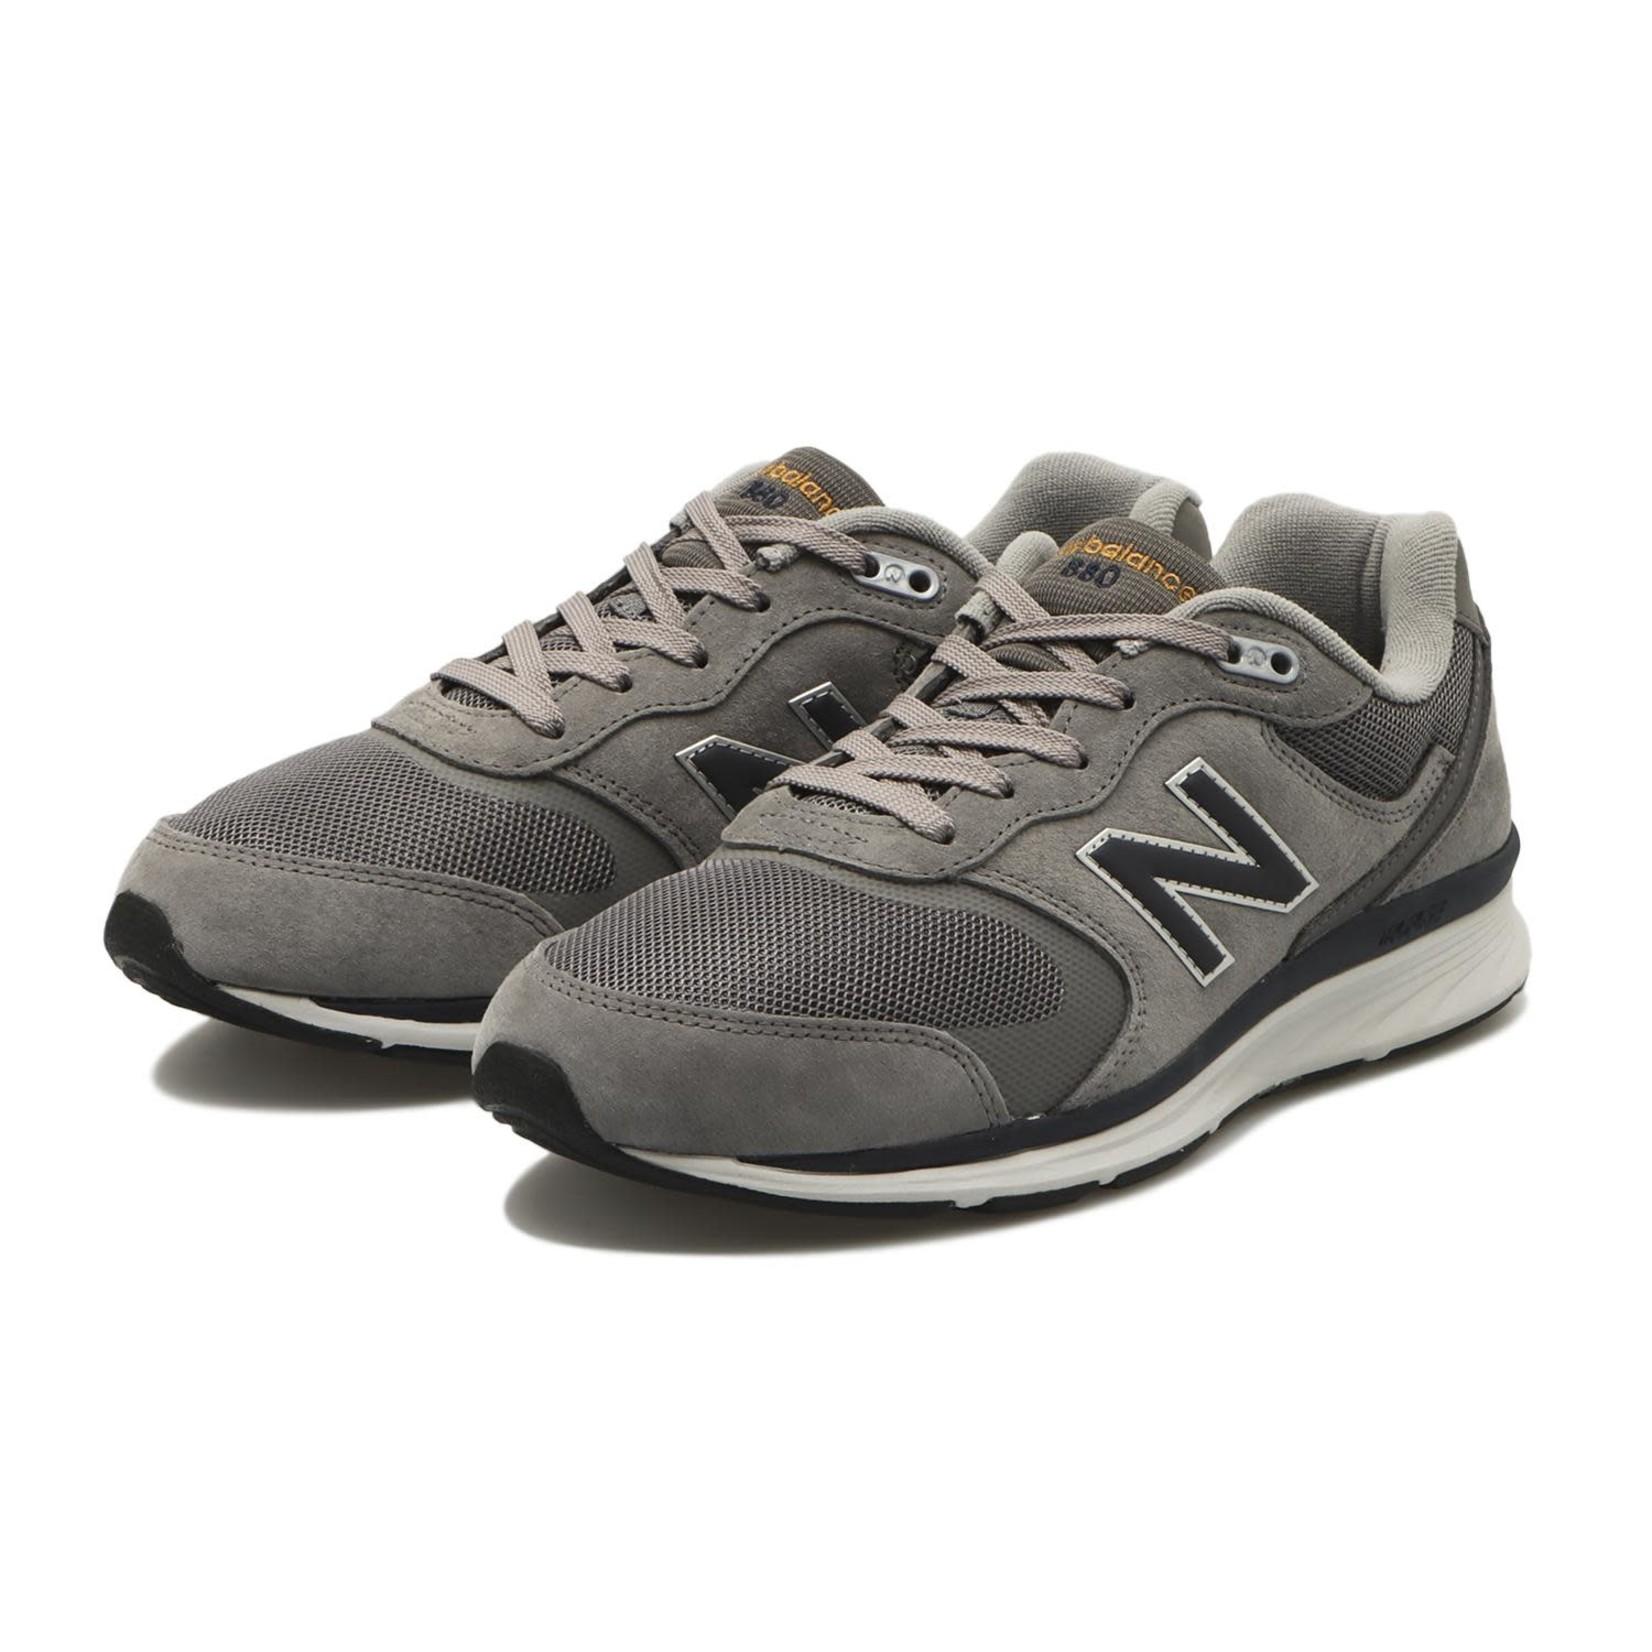 New Balance New Balance Walking Shoes, MW880CN4, Mens